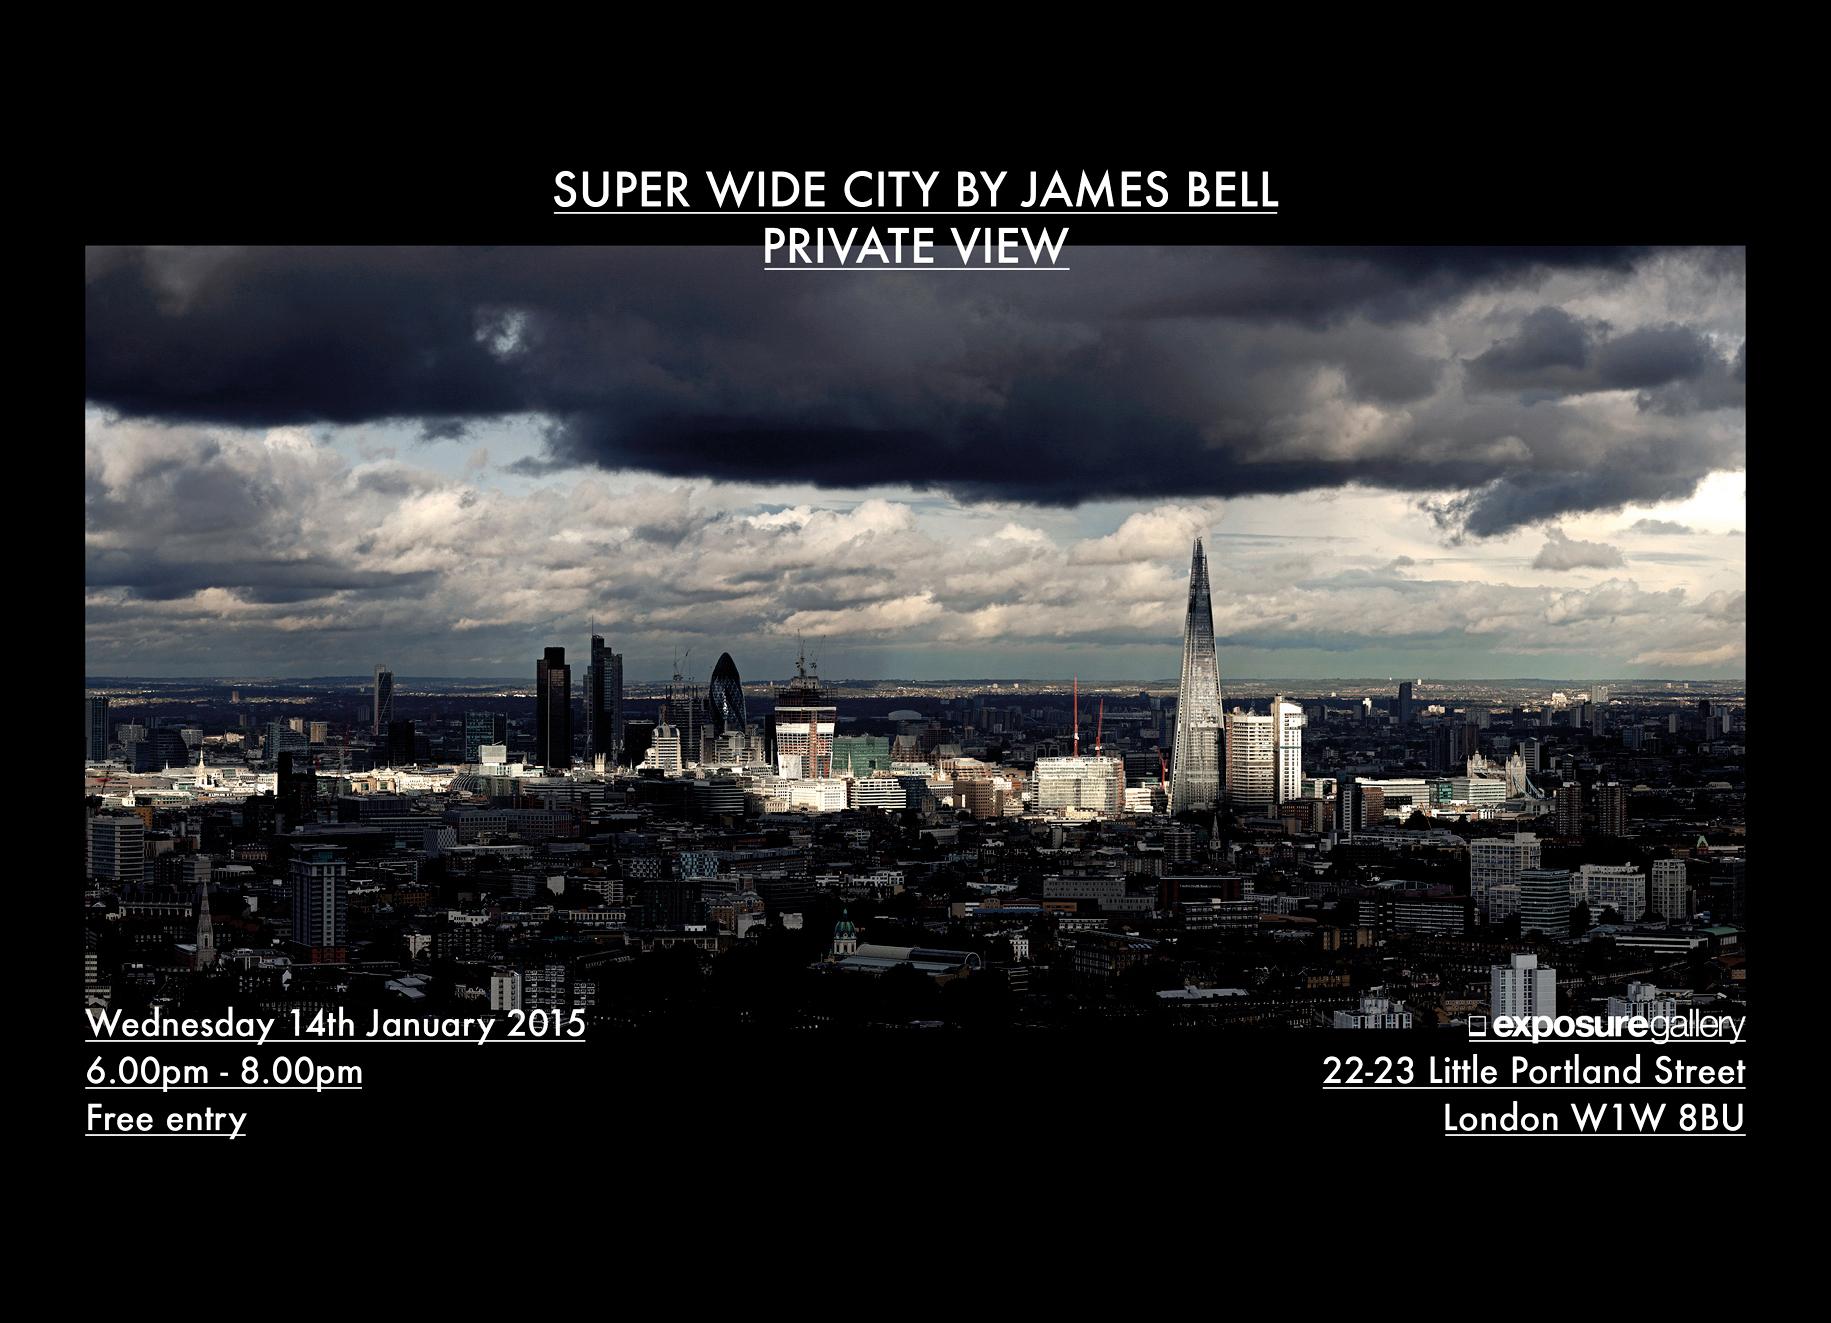 Super Wide City Exhibition 2015